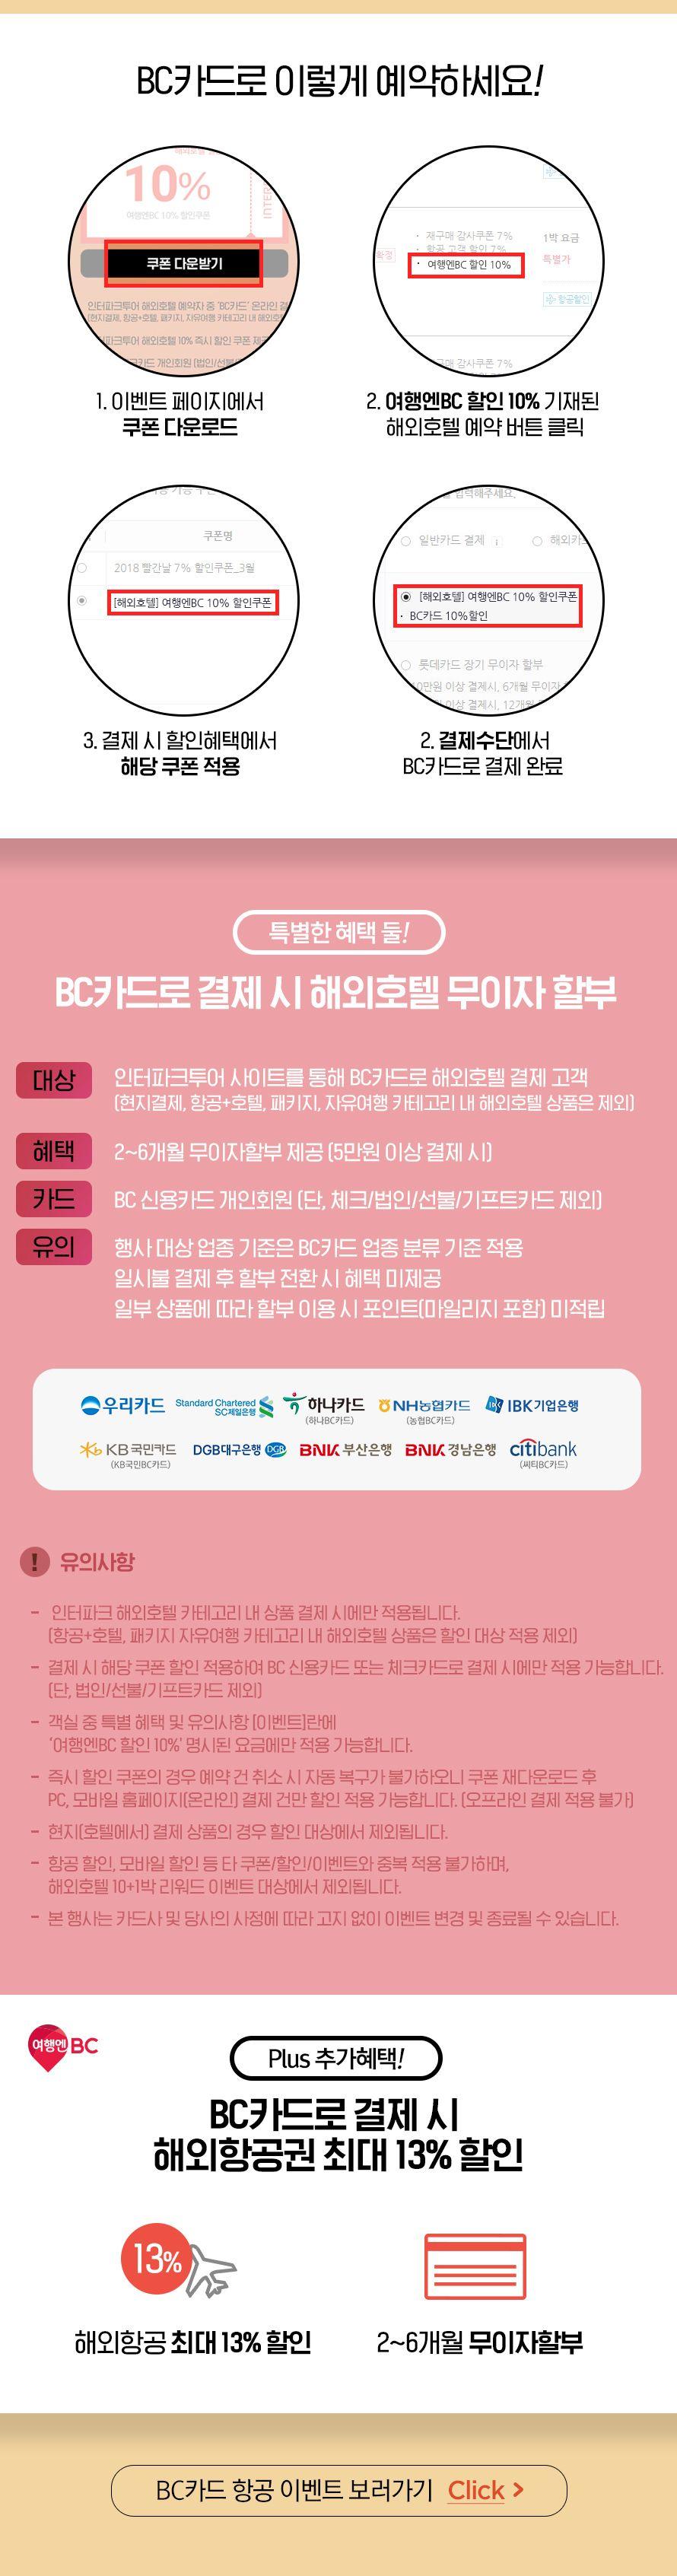 BC카드 해외호텔 10%즉시할인 : 인터파크투어 이벤트혜택존